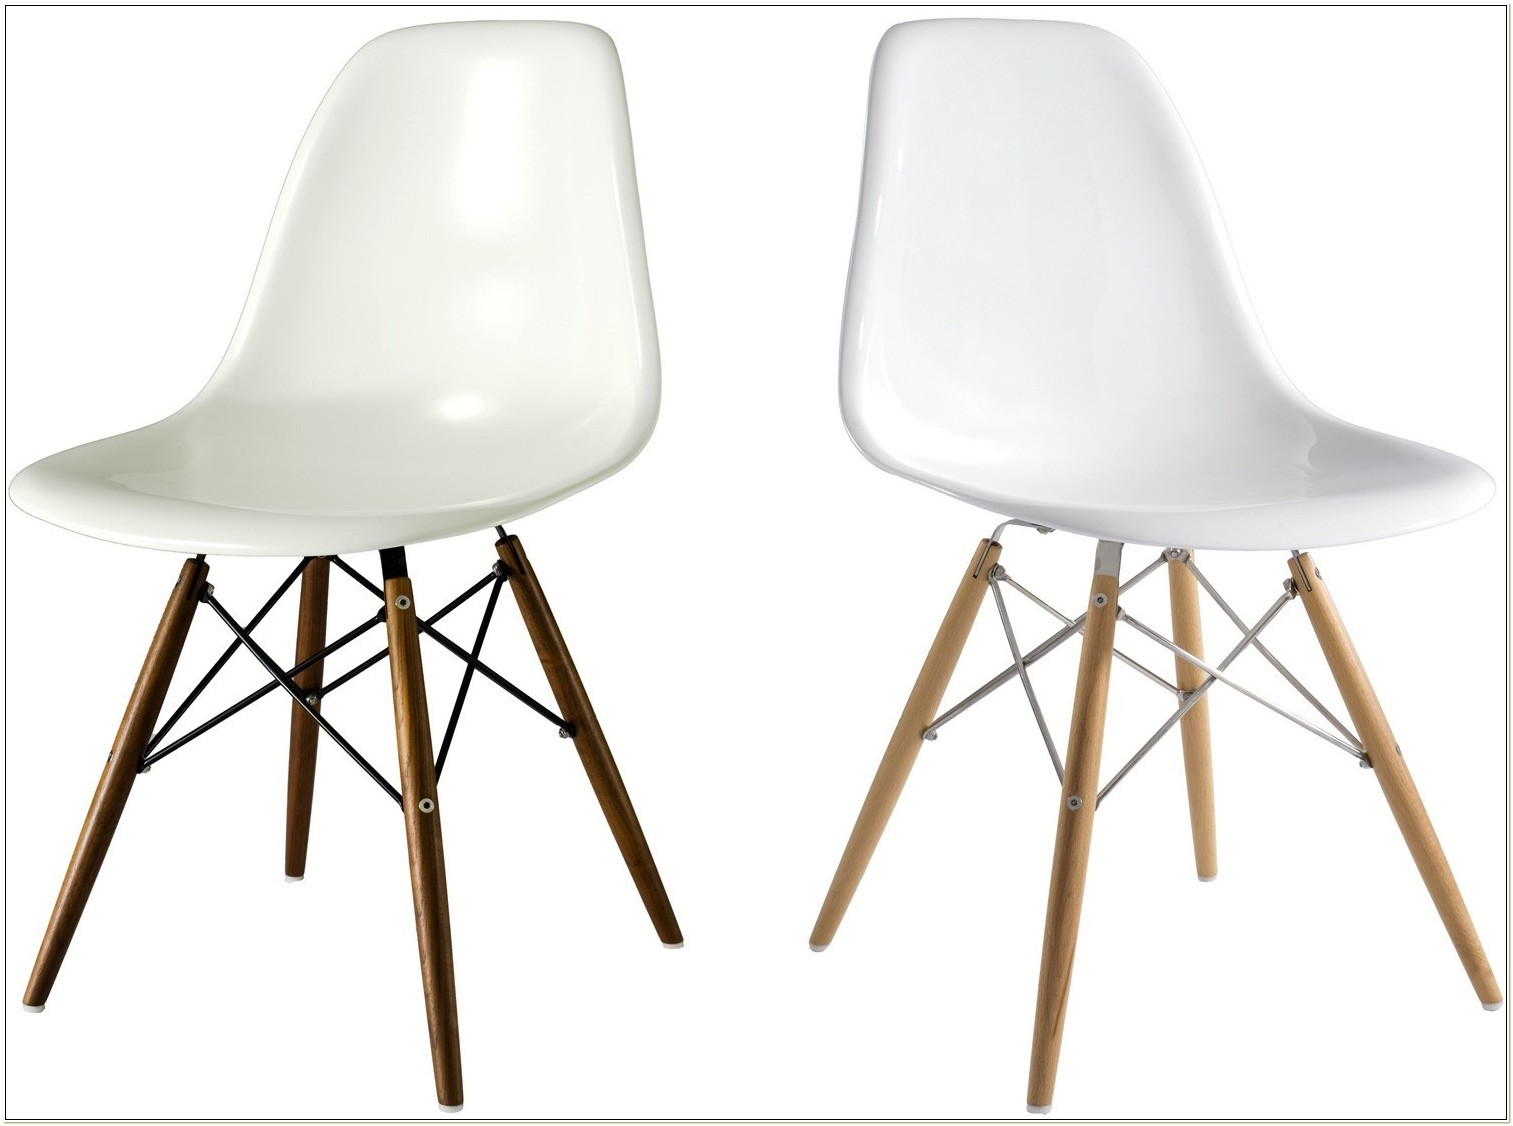 Eames Fiberglass Shell Chair Replica